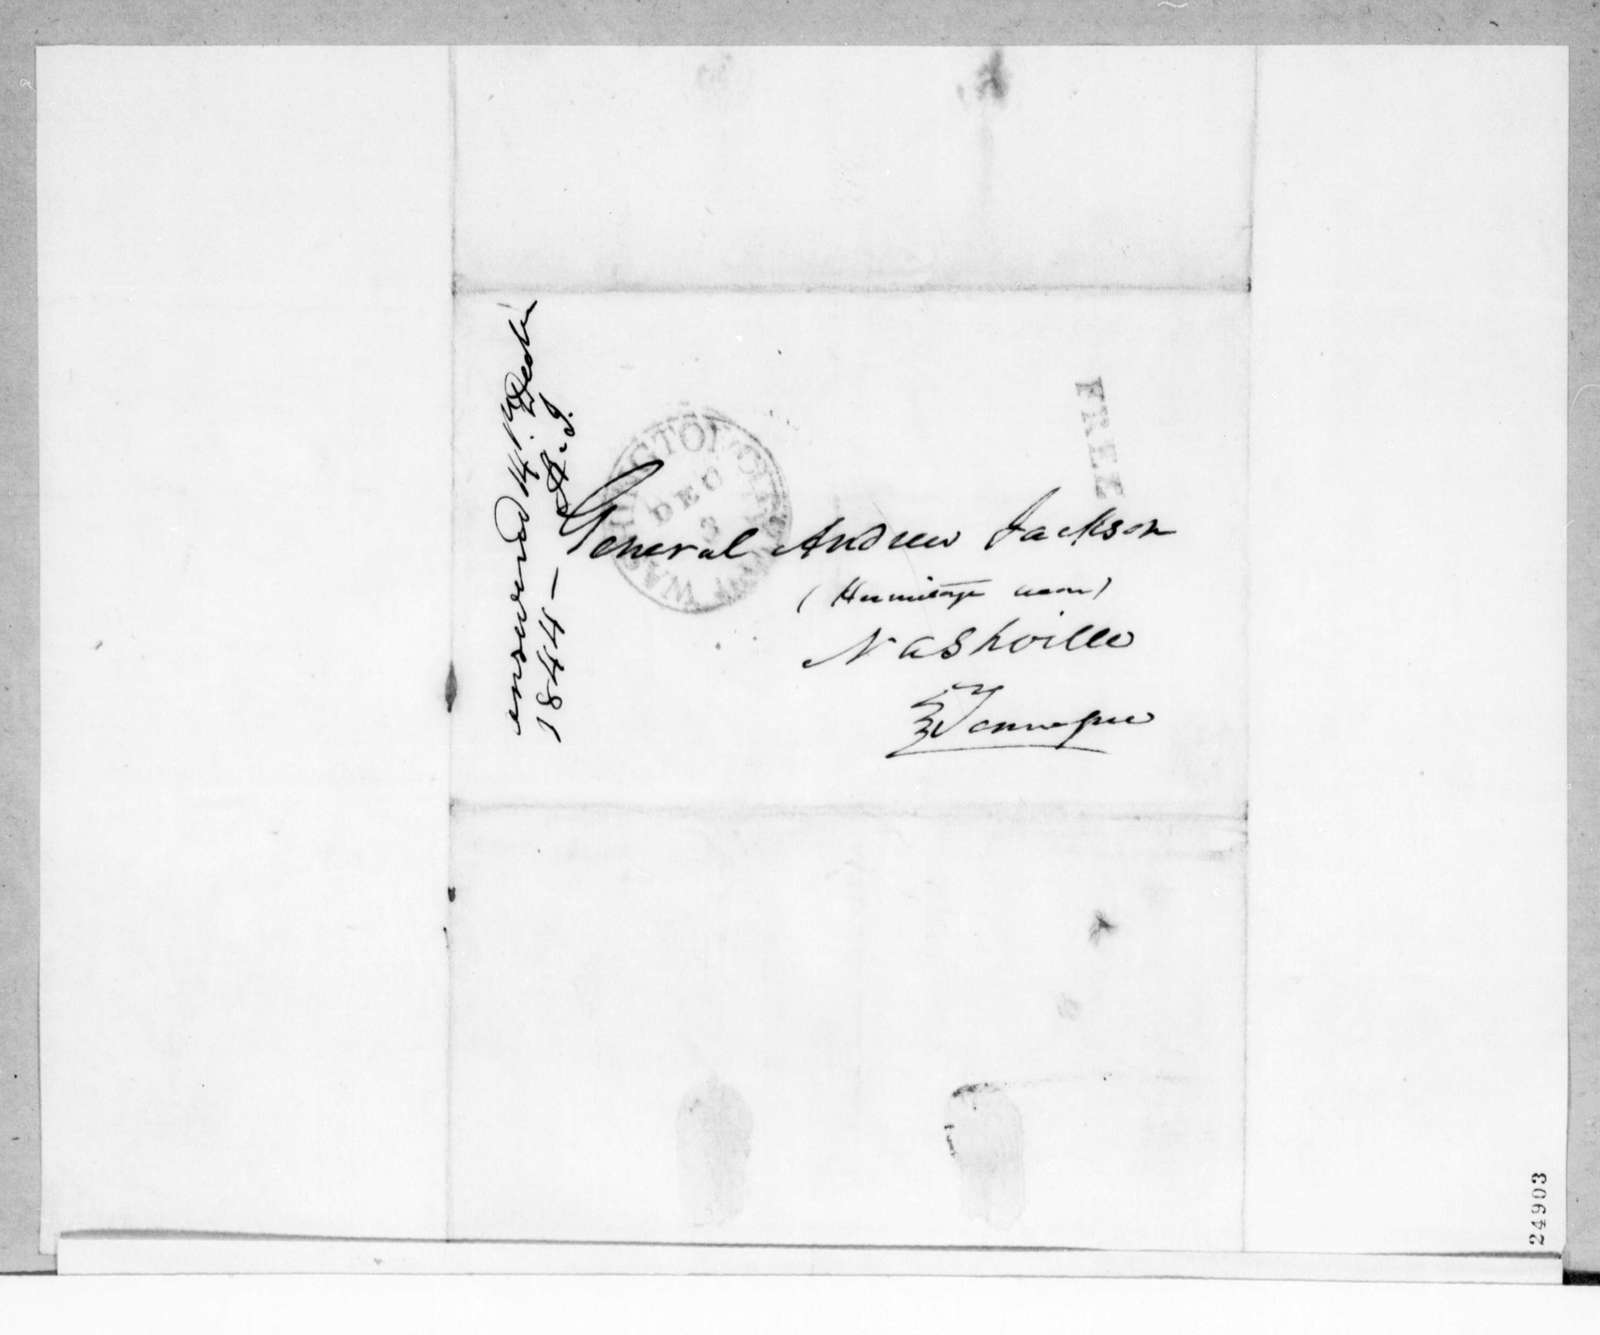 William S. Parrott to Andrew Jackson, December 14, 1844